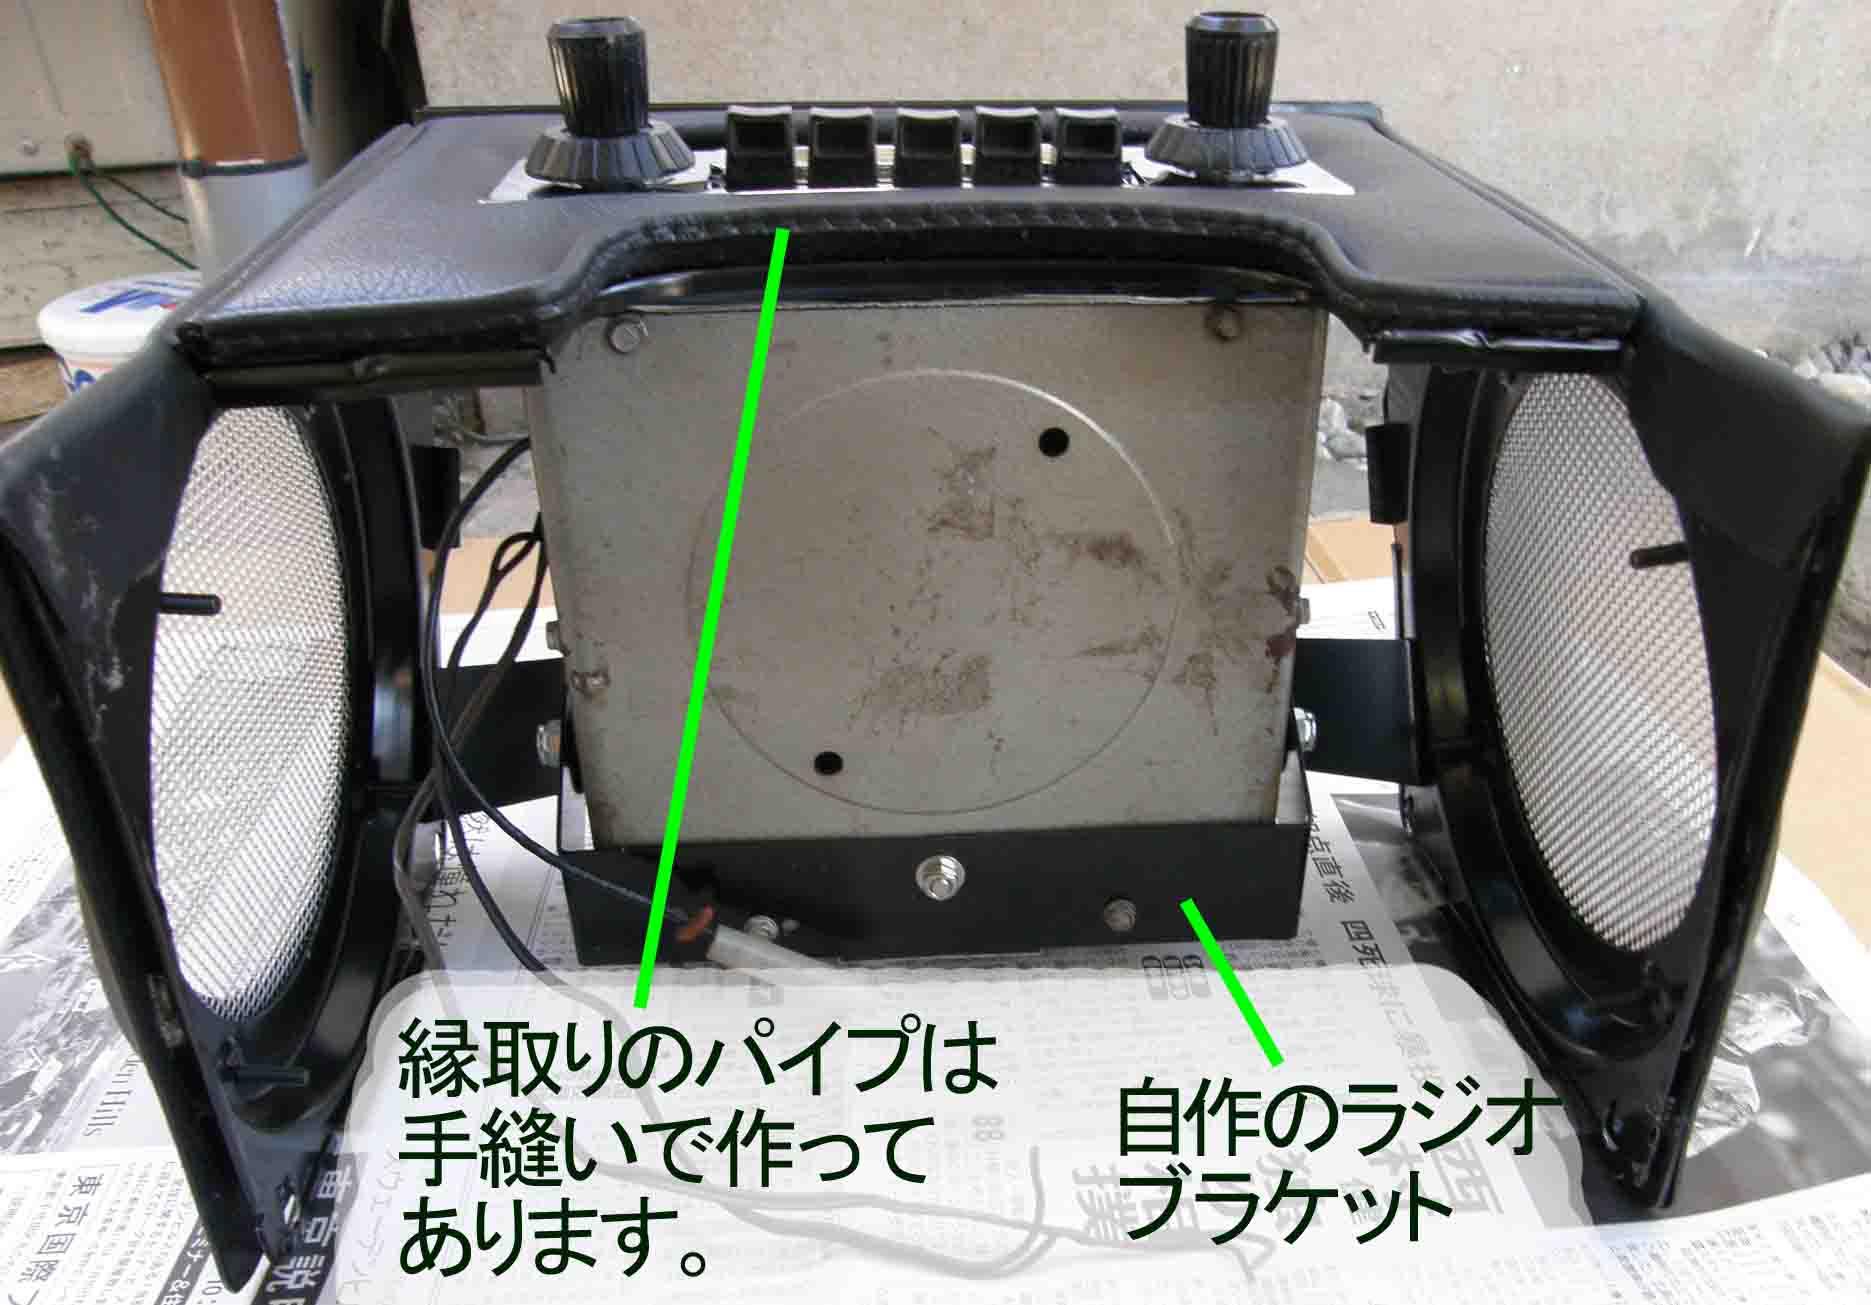 blogPC170610.jpg